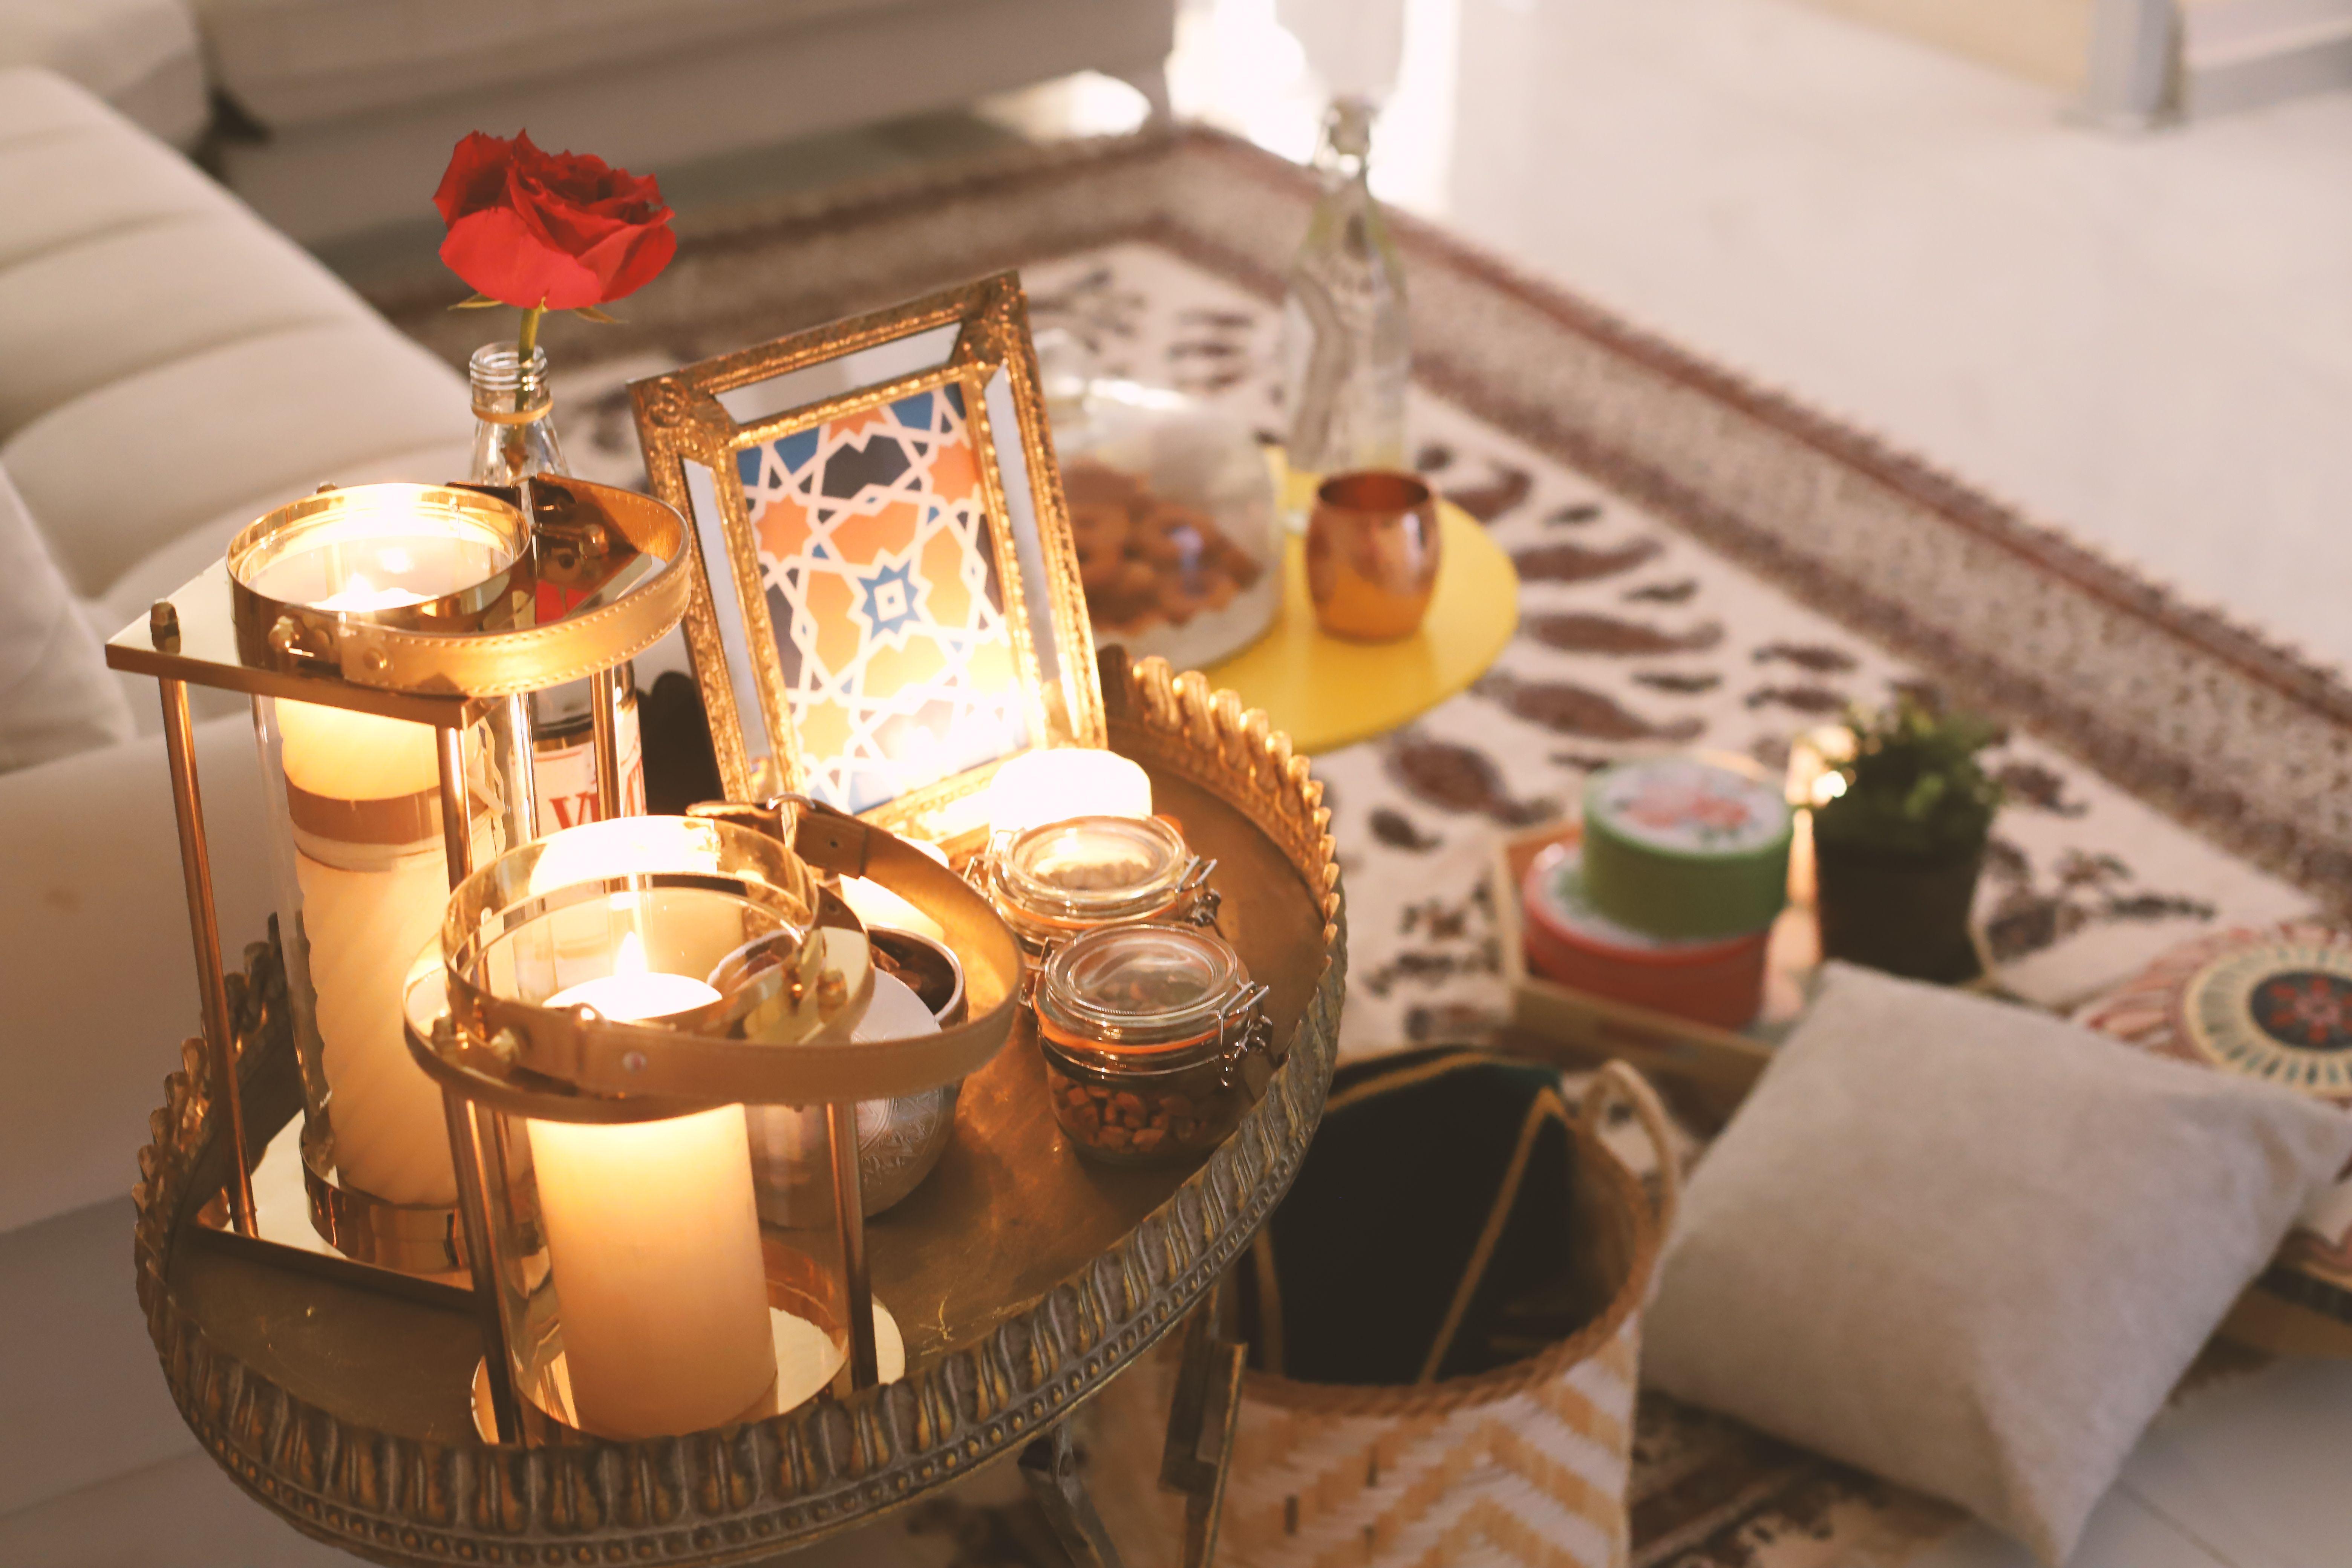 رمضان جلسة رمضانية سحور عمان افكار Ramadan2018 Ramadan رمضان Table Decorations Decor Ramadan